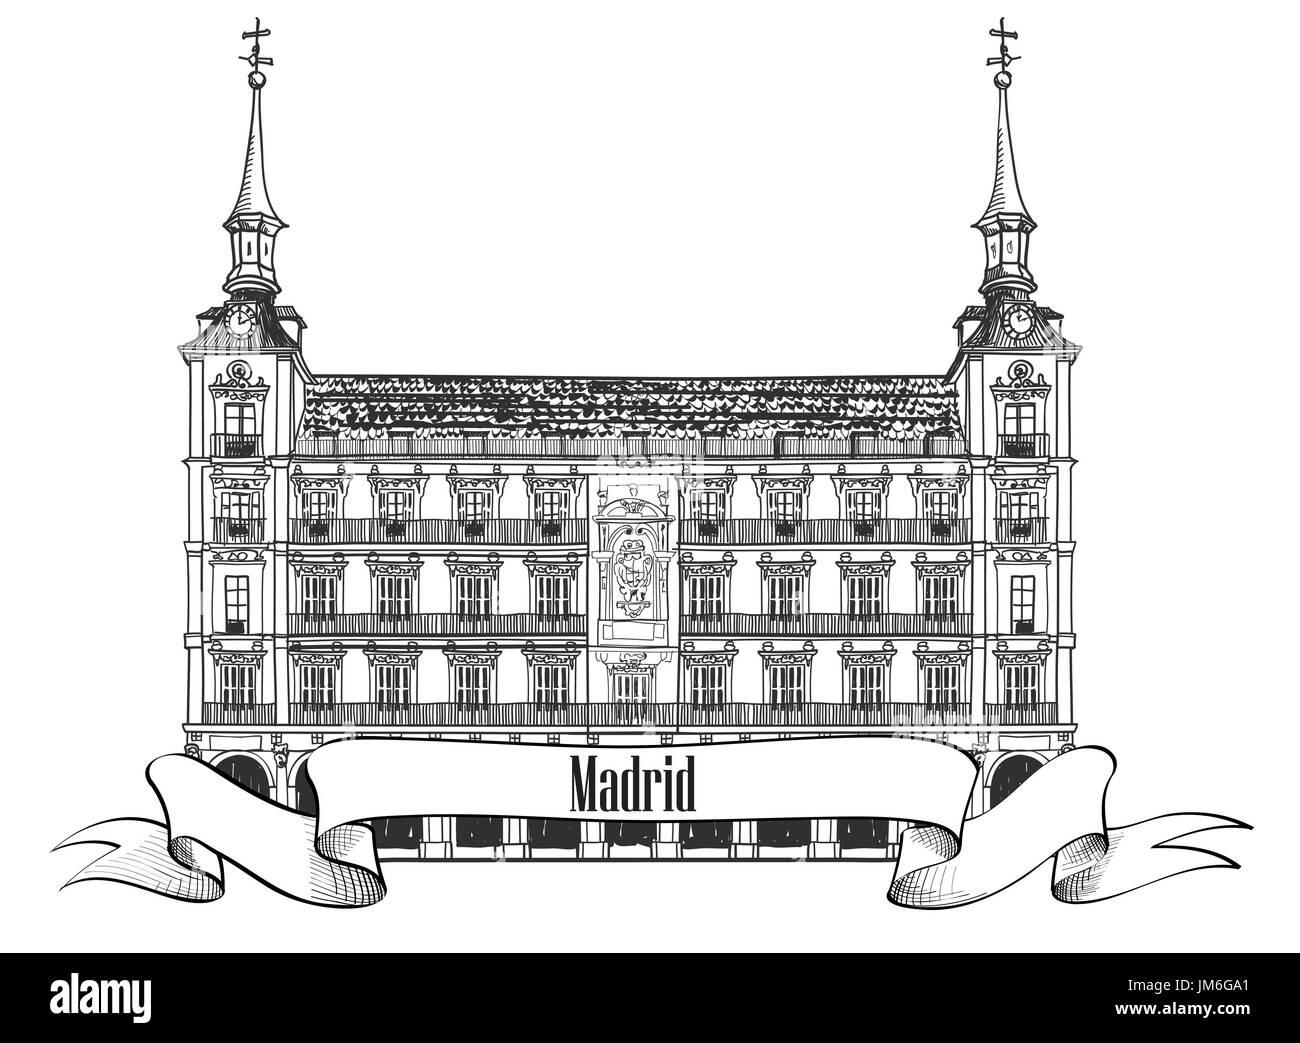 Madrid landmark label . Spain symbol. Madrid, house of Phillip III in Plaza Mayor, Sketch collection - Stock Image